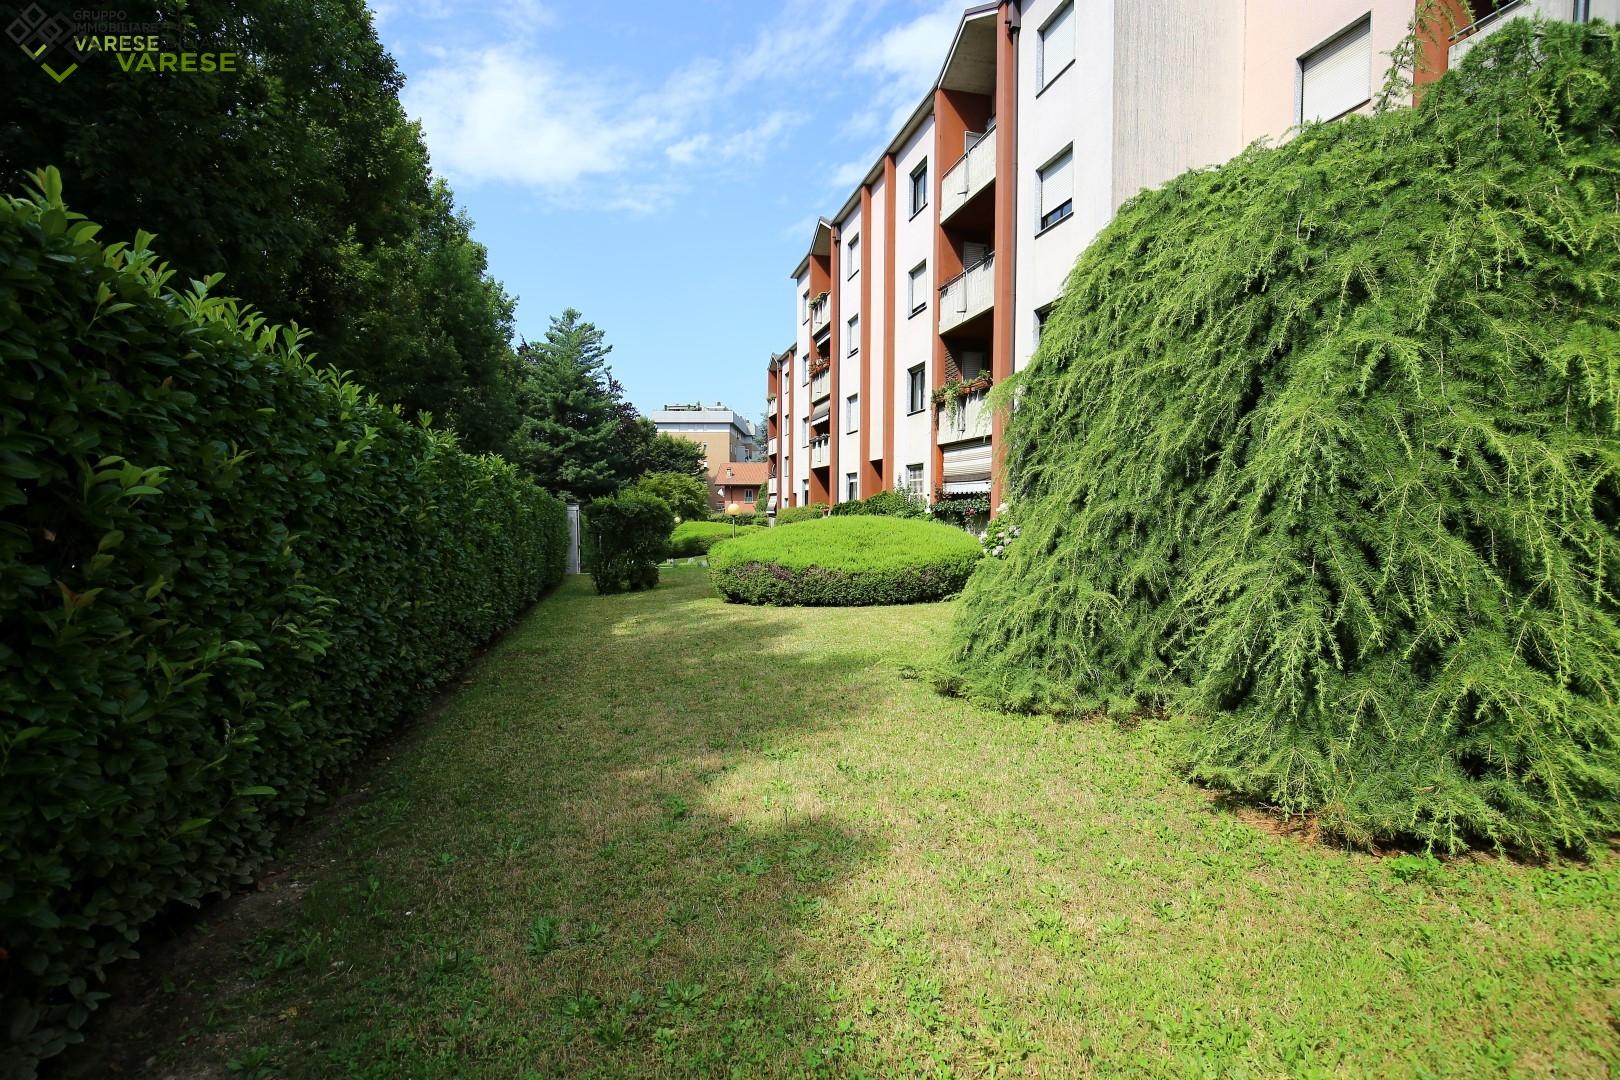 Appartamento, 105 Mq, Vendita - Varese (Varese)